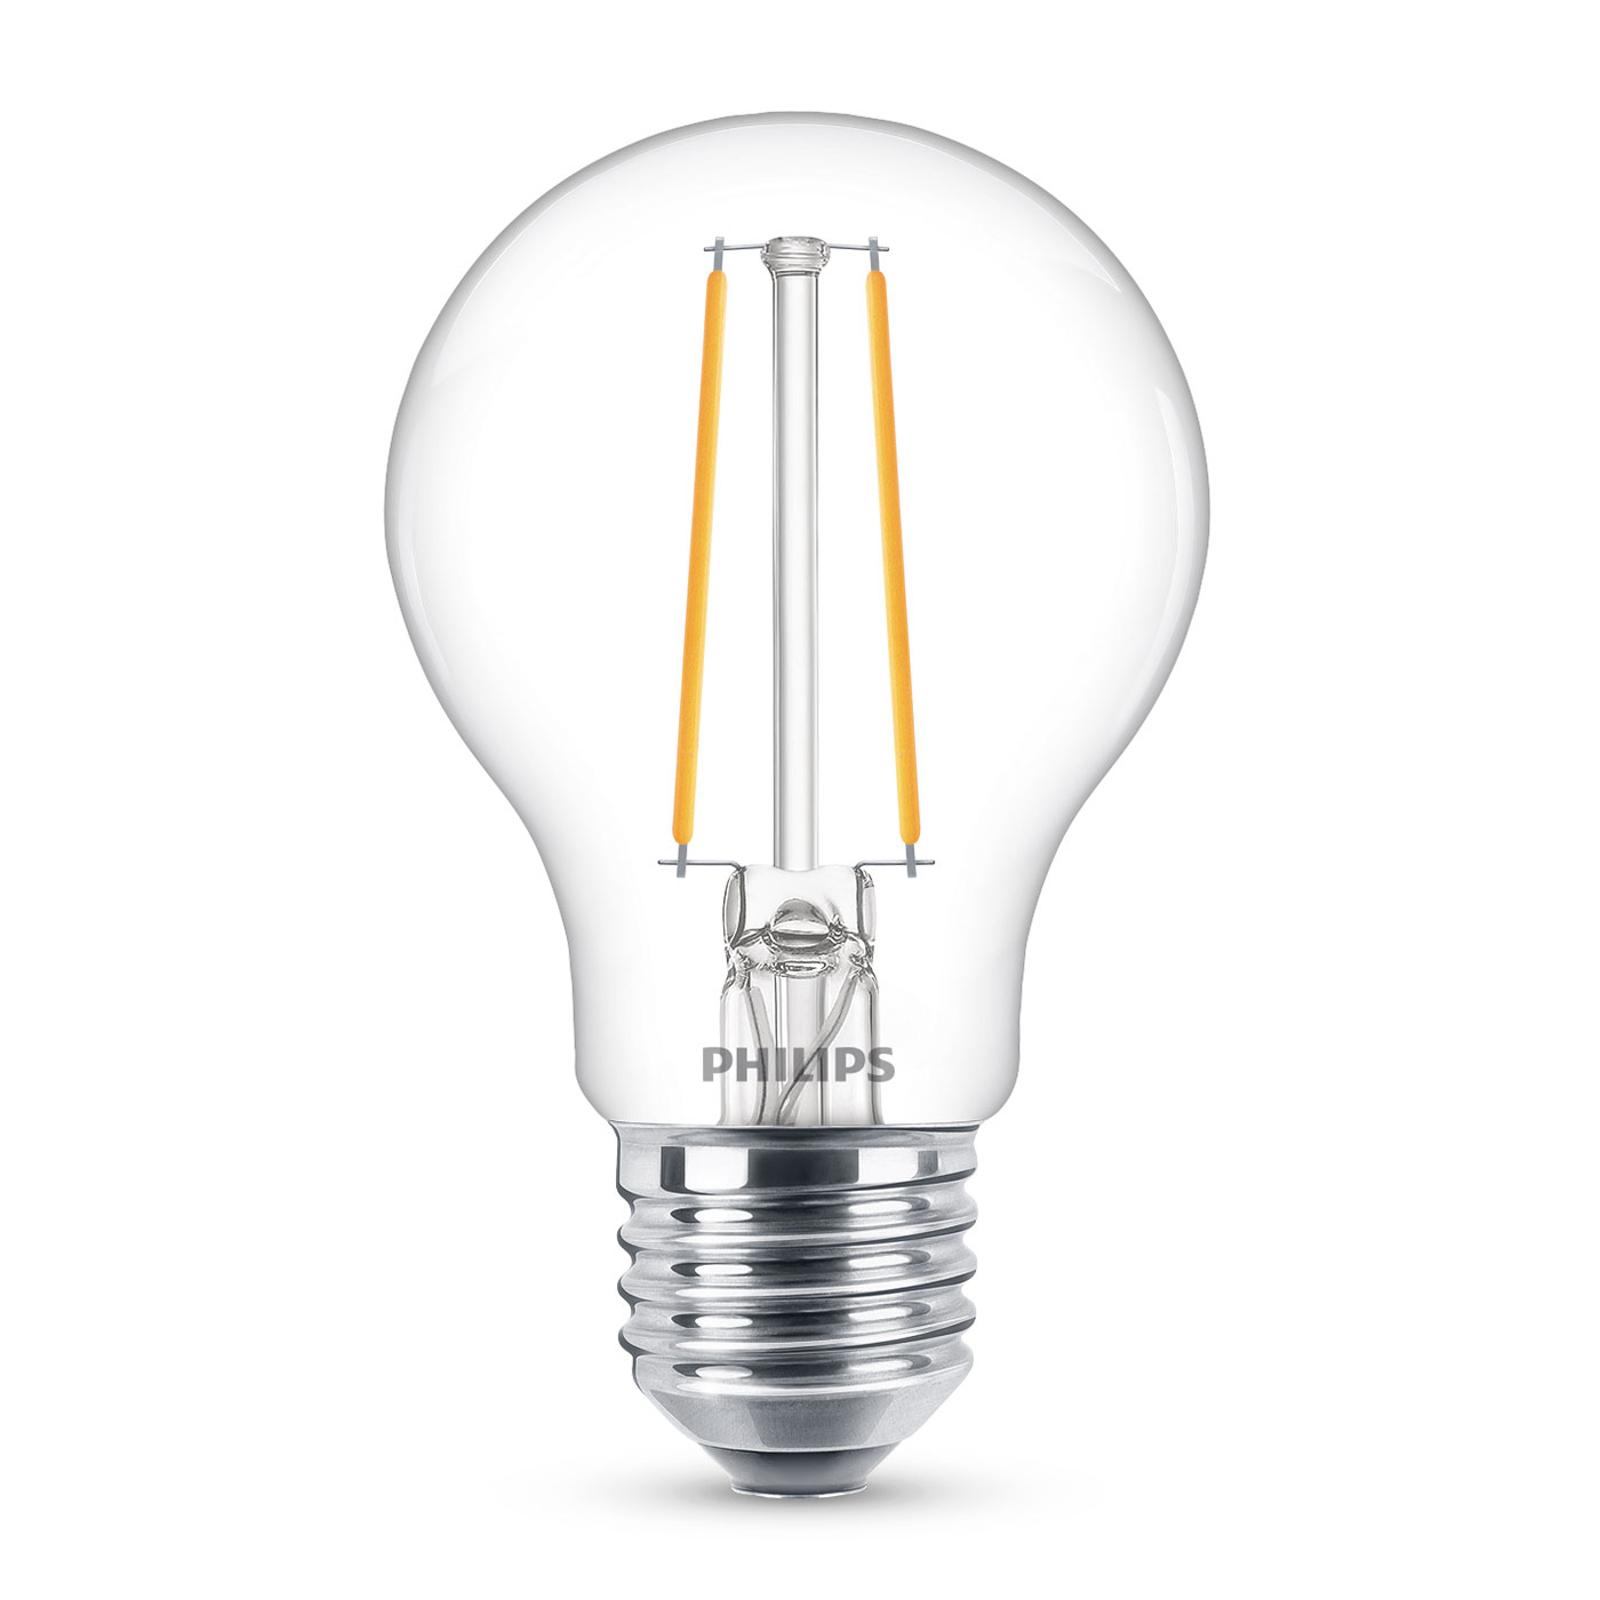 Philips Classic LED-Lampe E27 A60 2,2W klar 2.700K